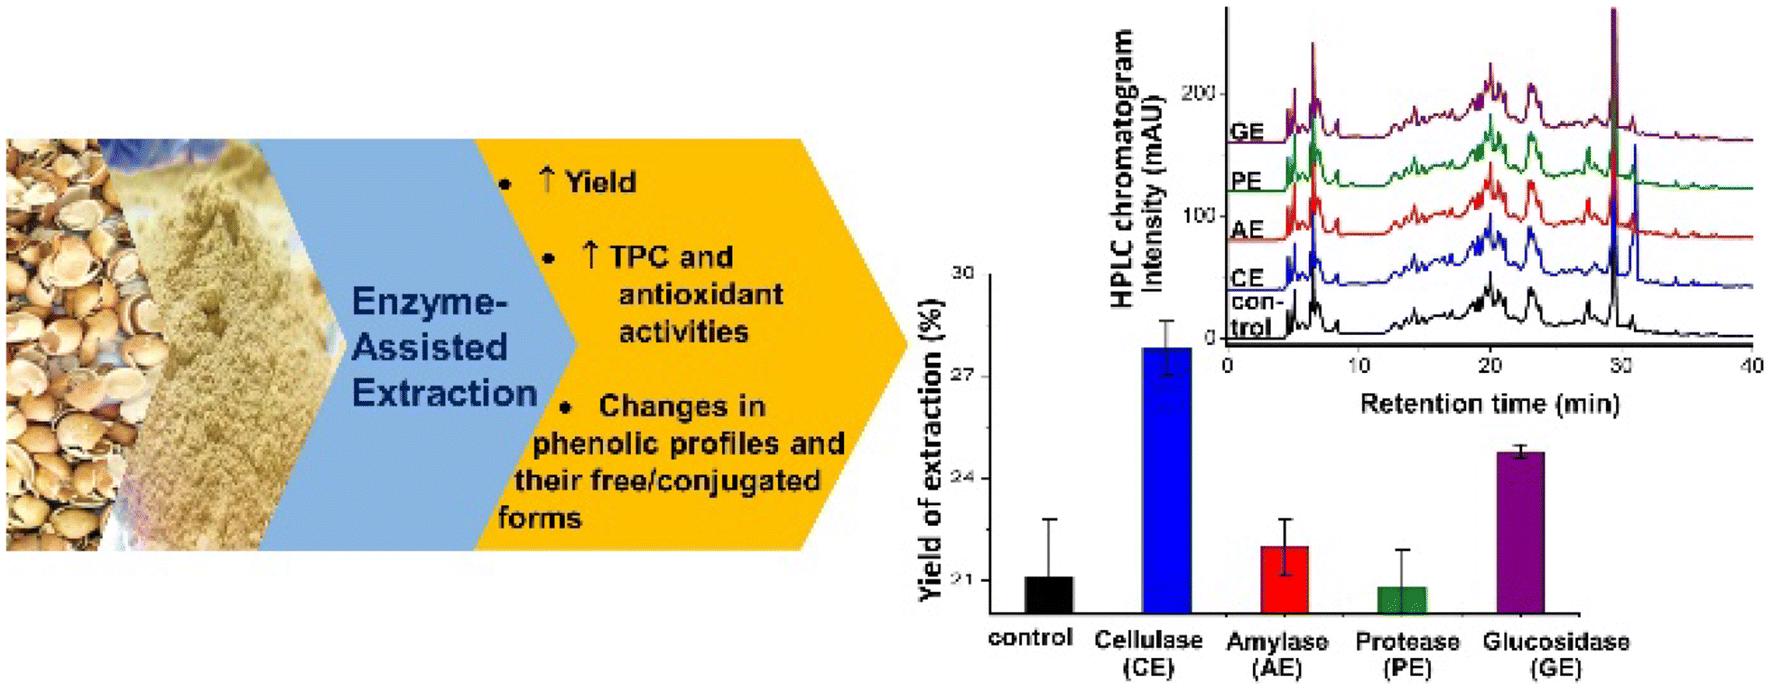 Improvement of Phenolic Contents and Antioxidant Activities